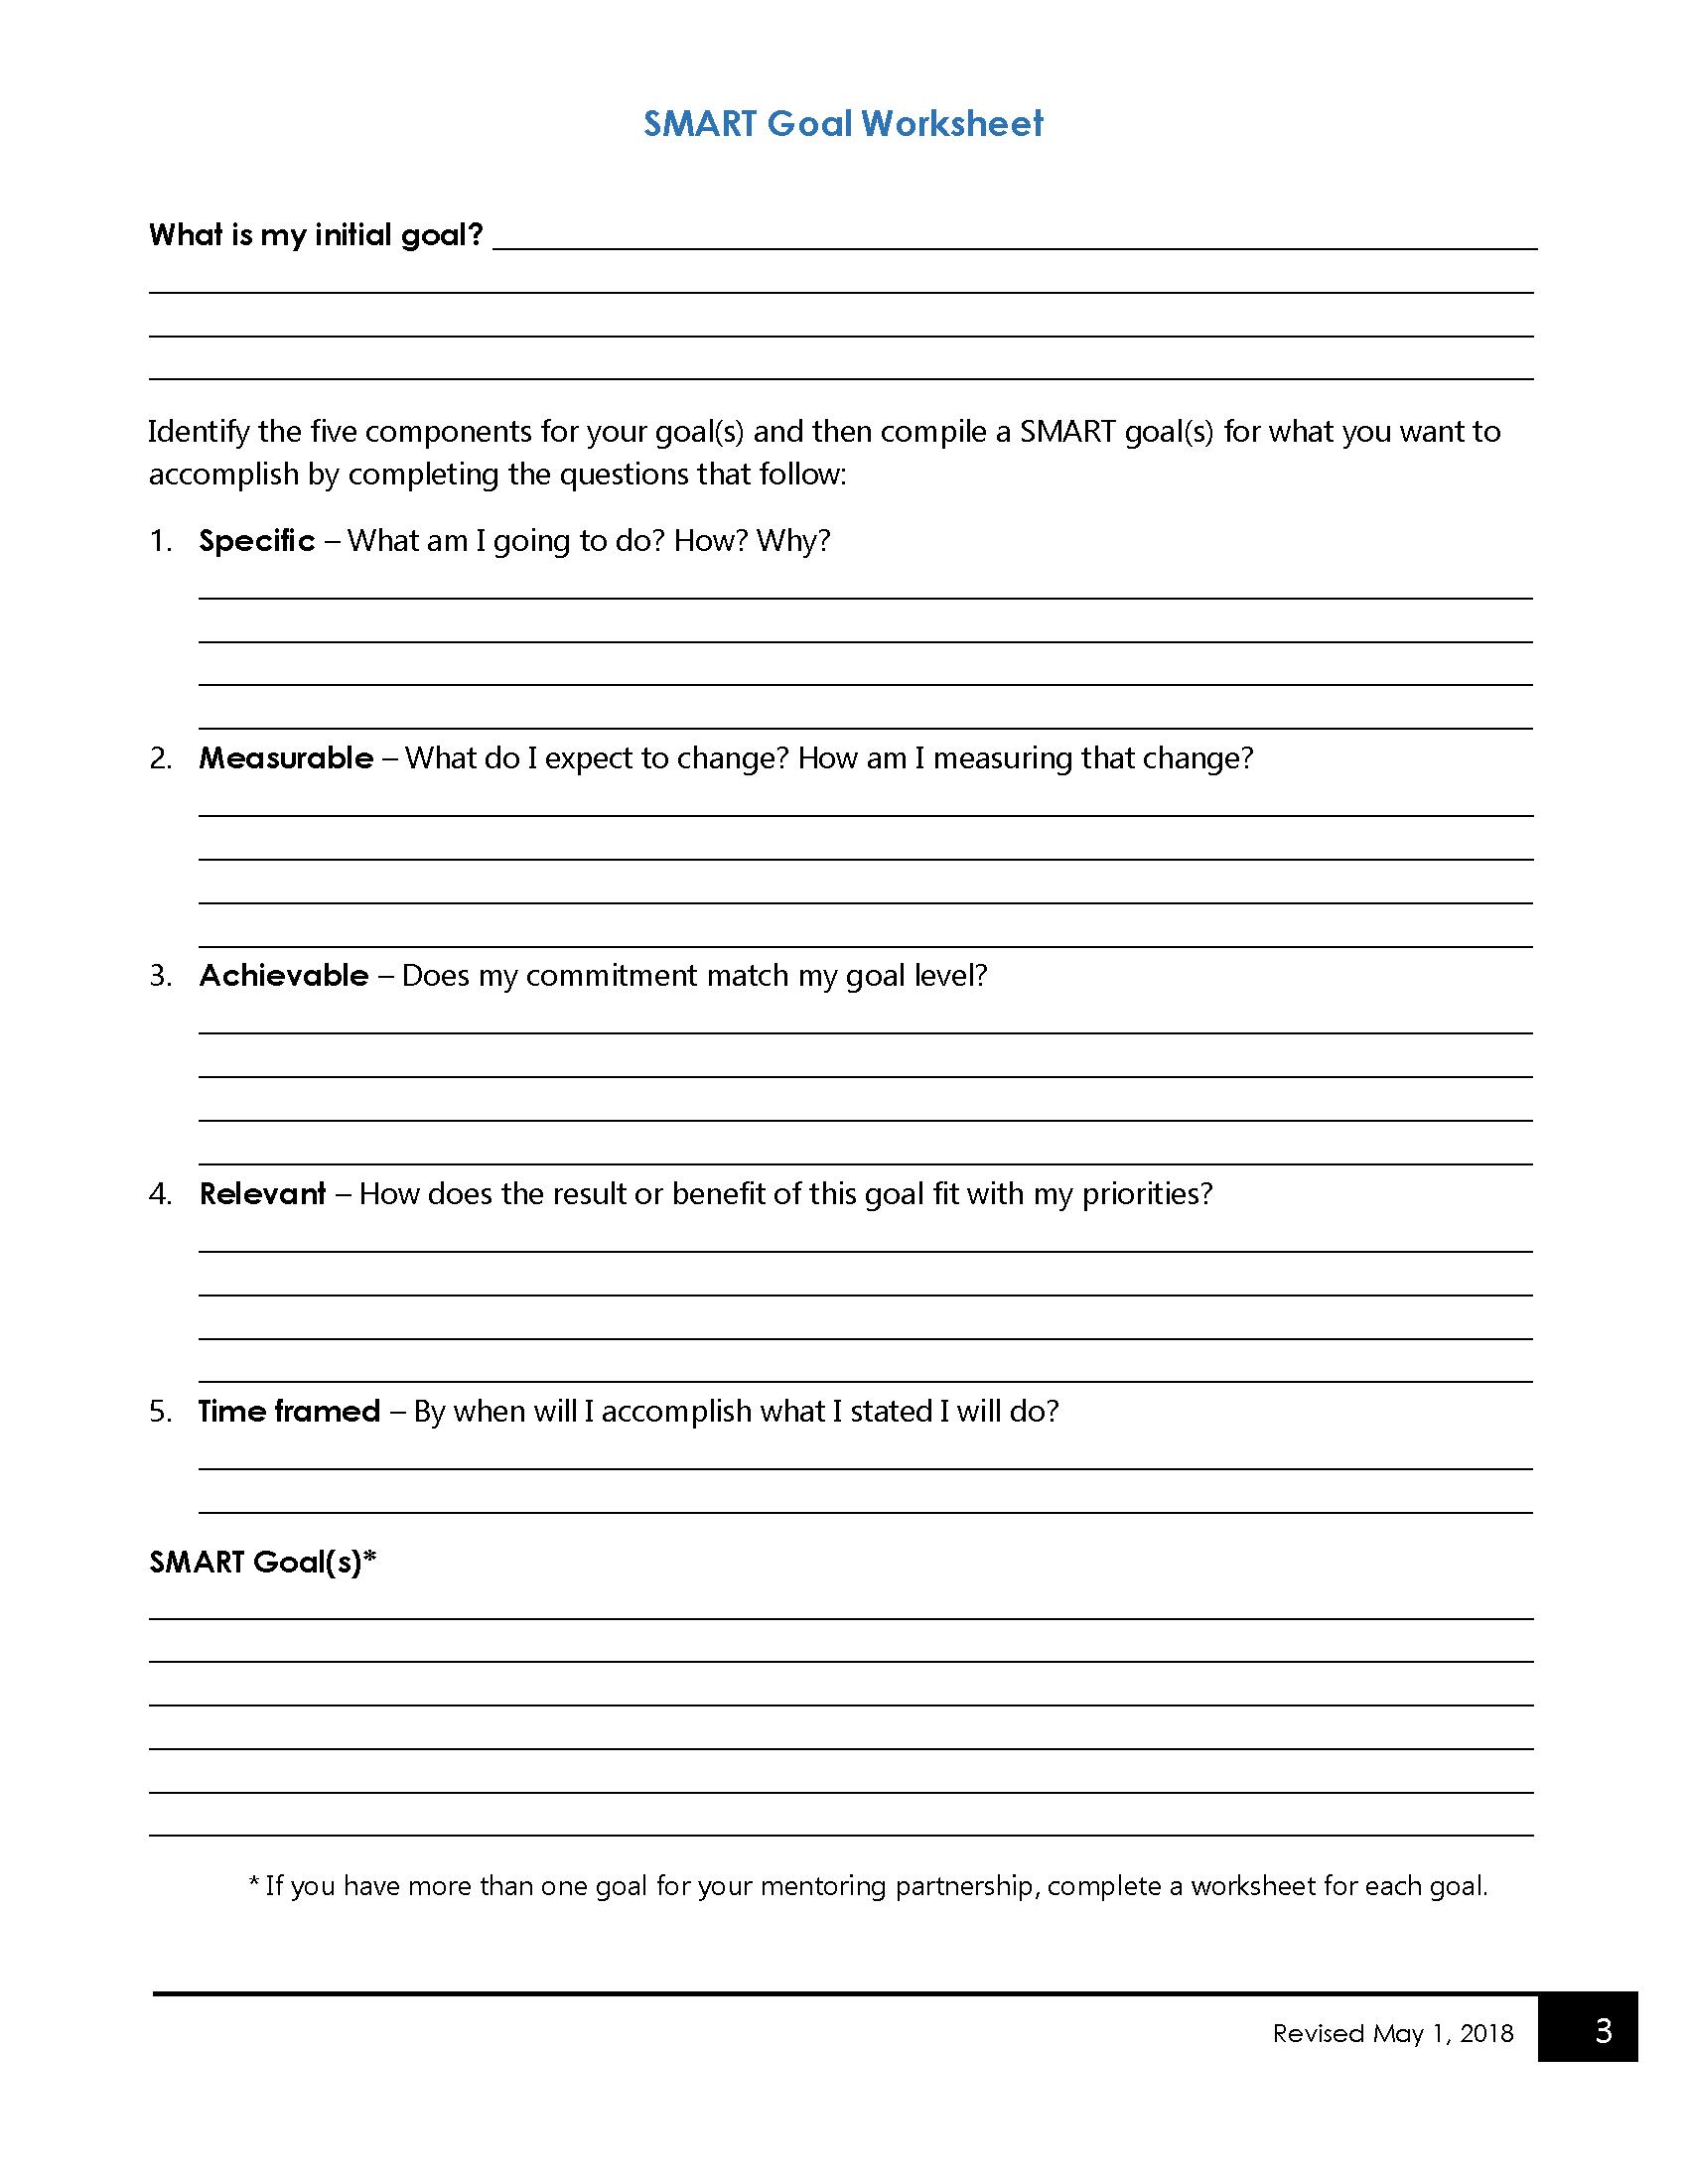 Mentoring Handbook Appendices